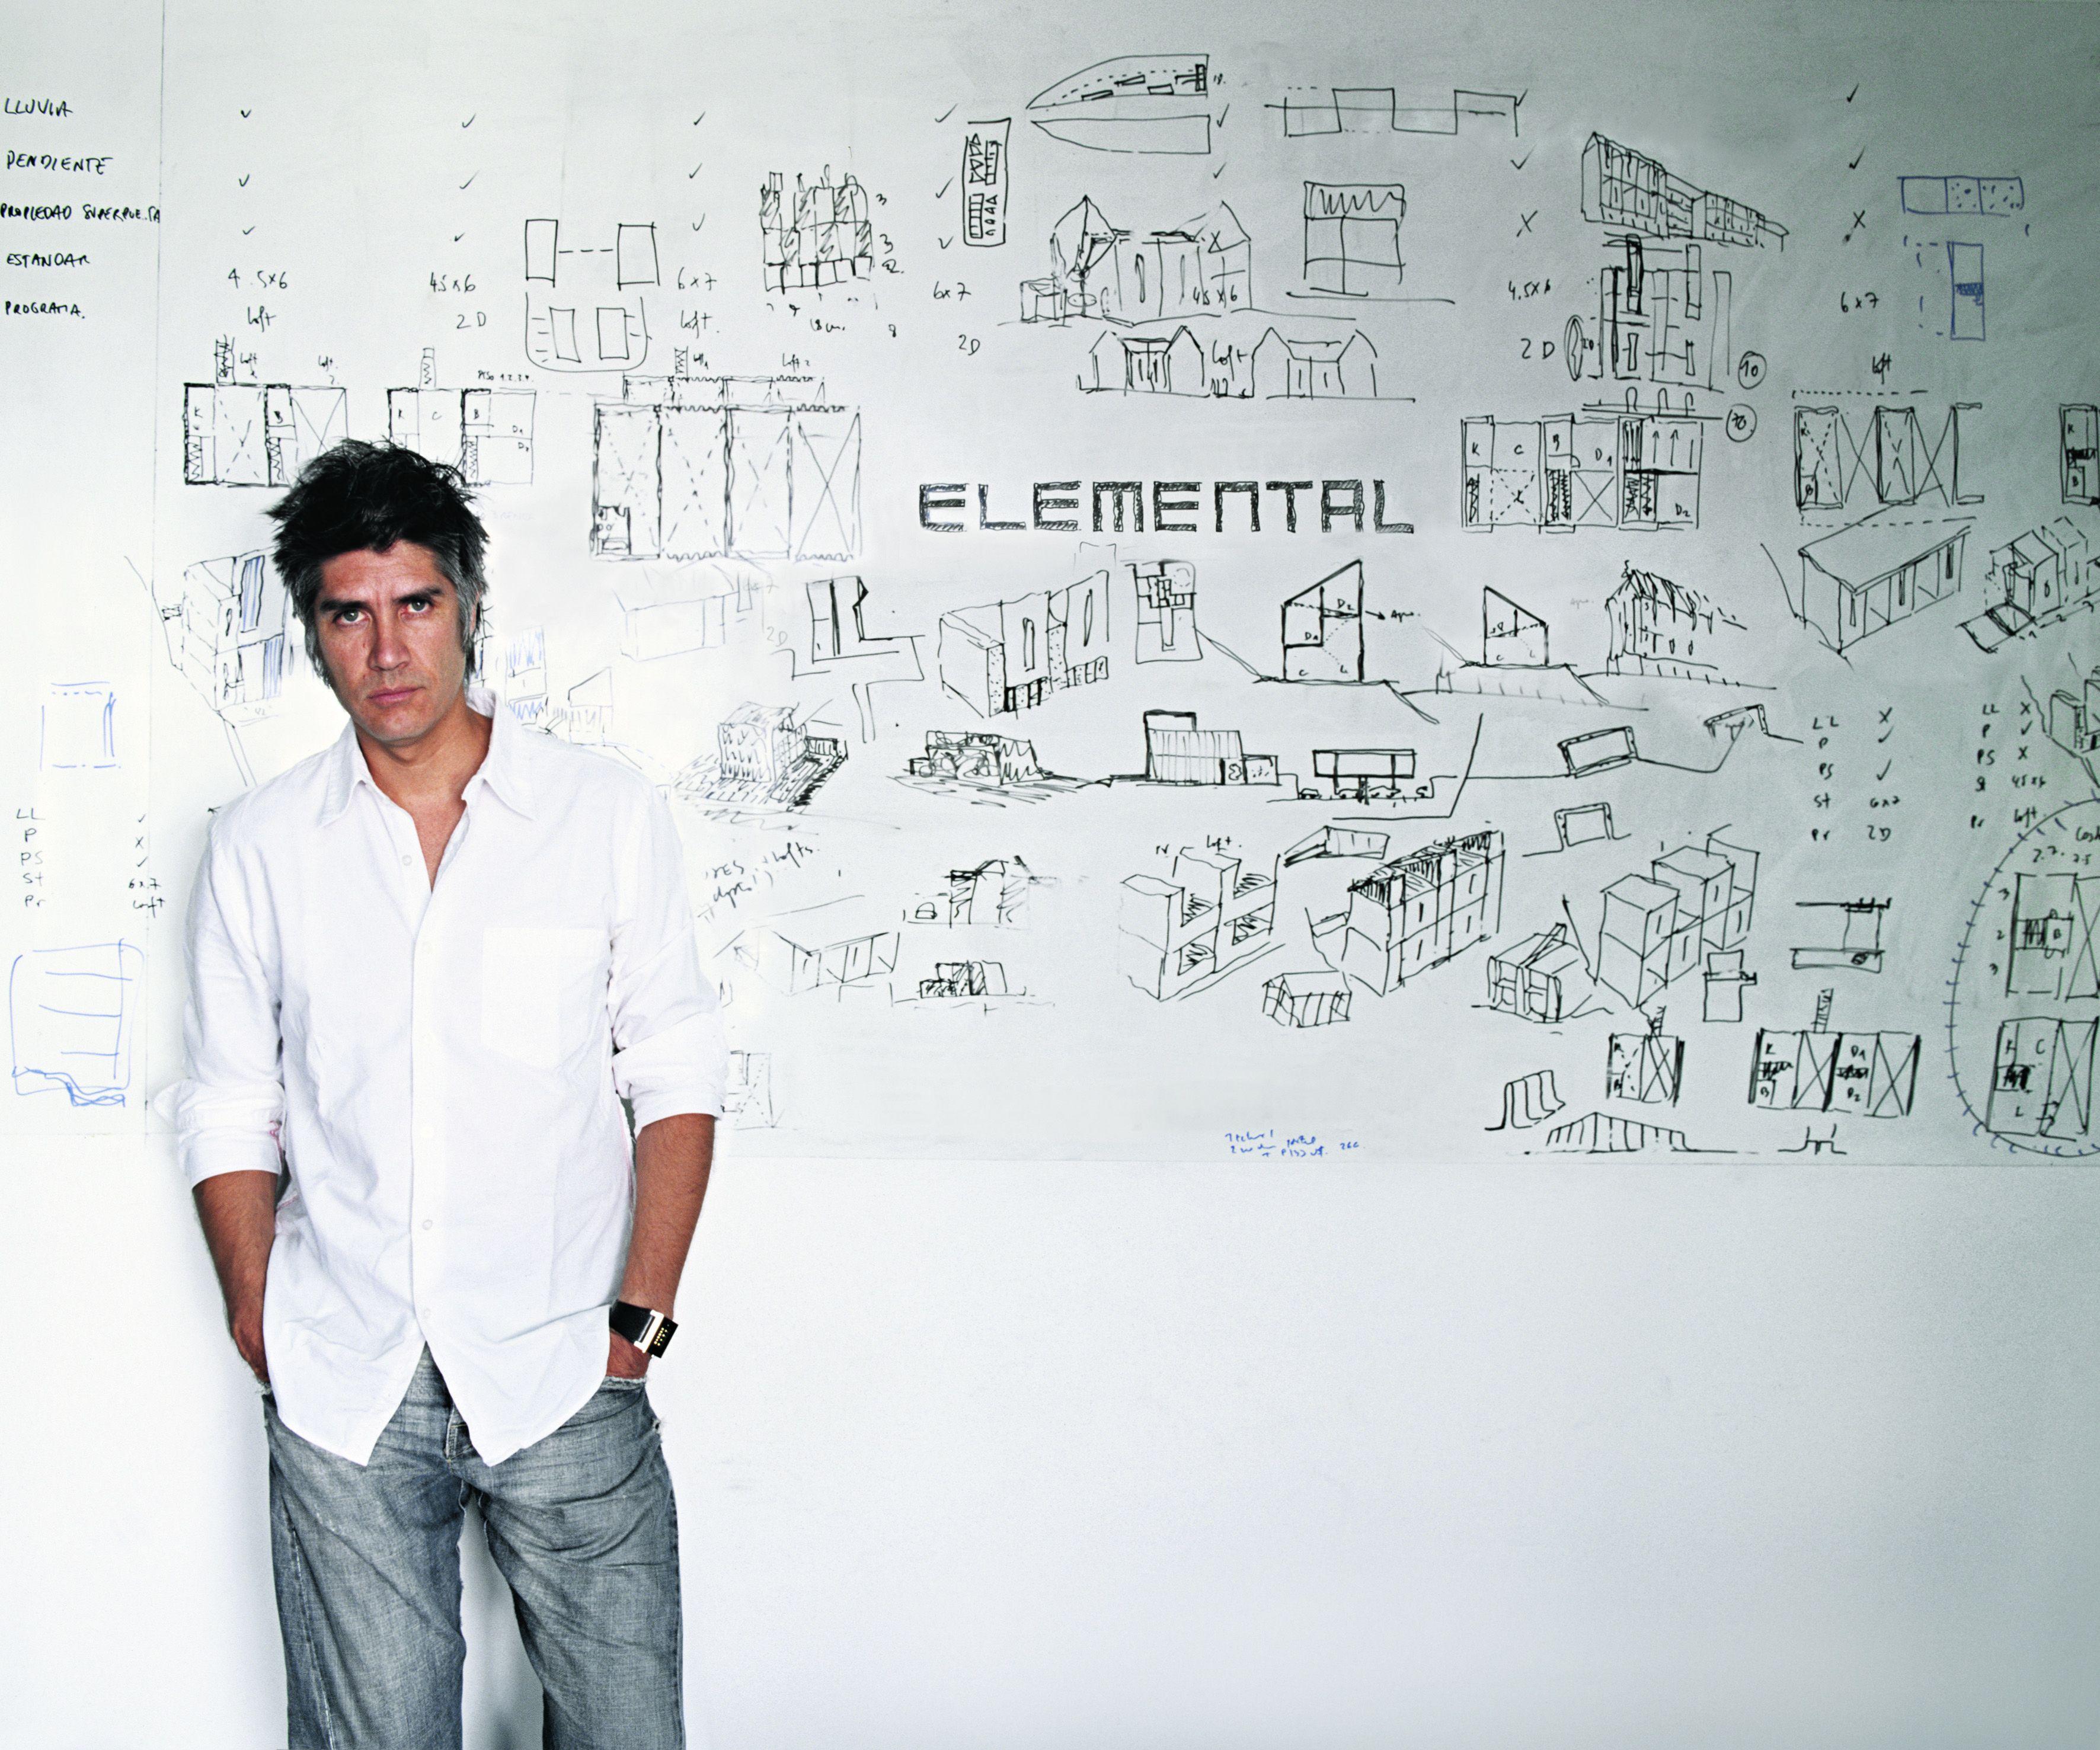 ARAVENA by Cristobal Palma Copie compressed - Alejandro Aravena dirigera la Biennale de Venise